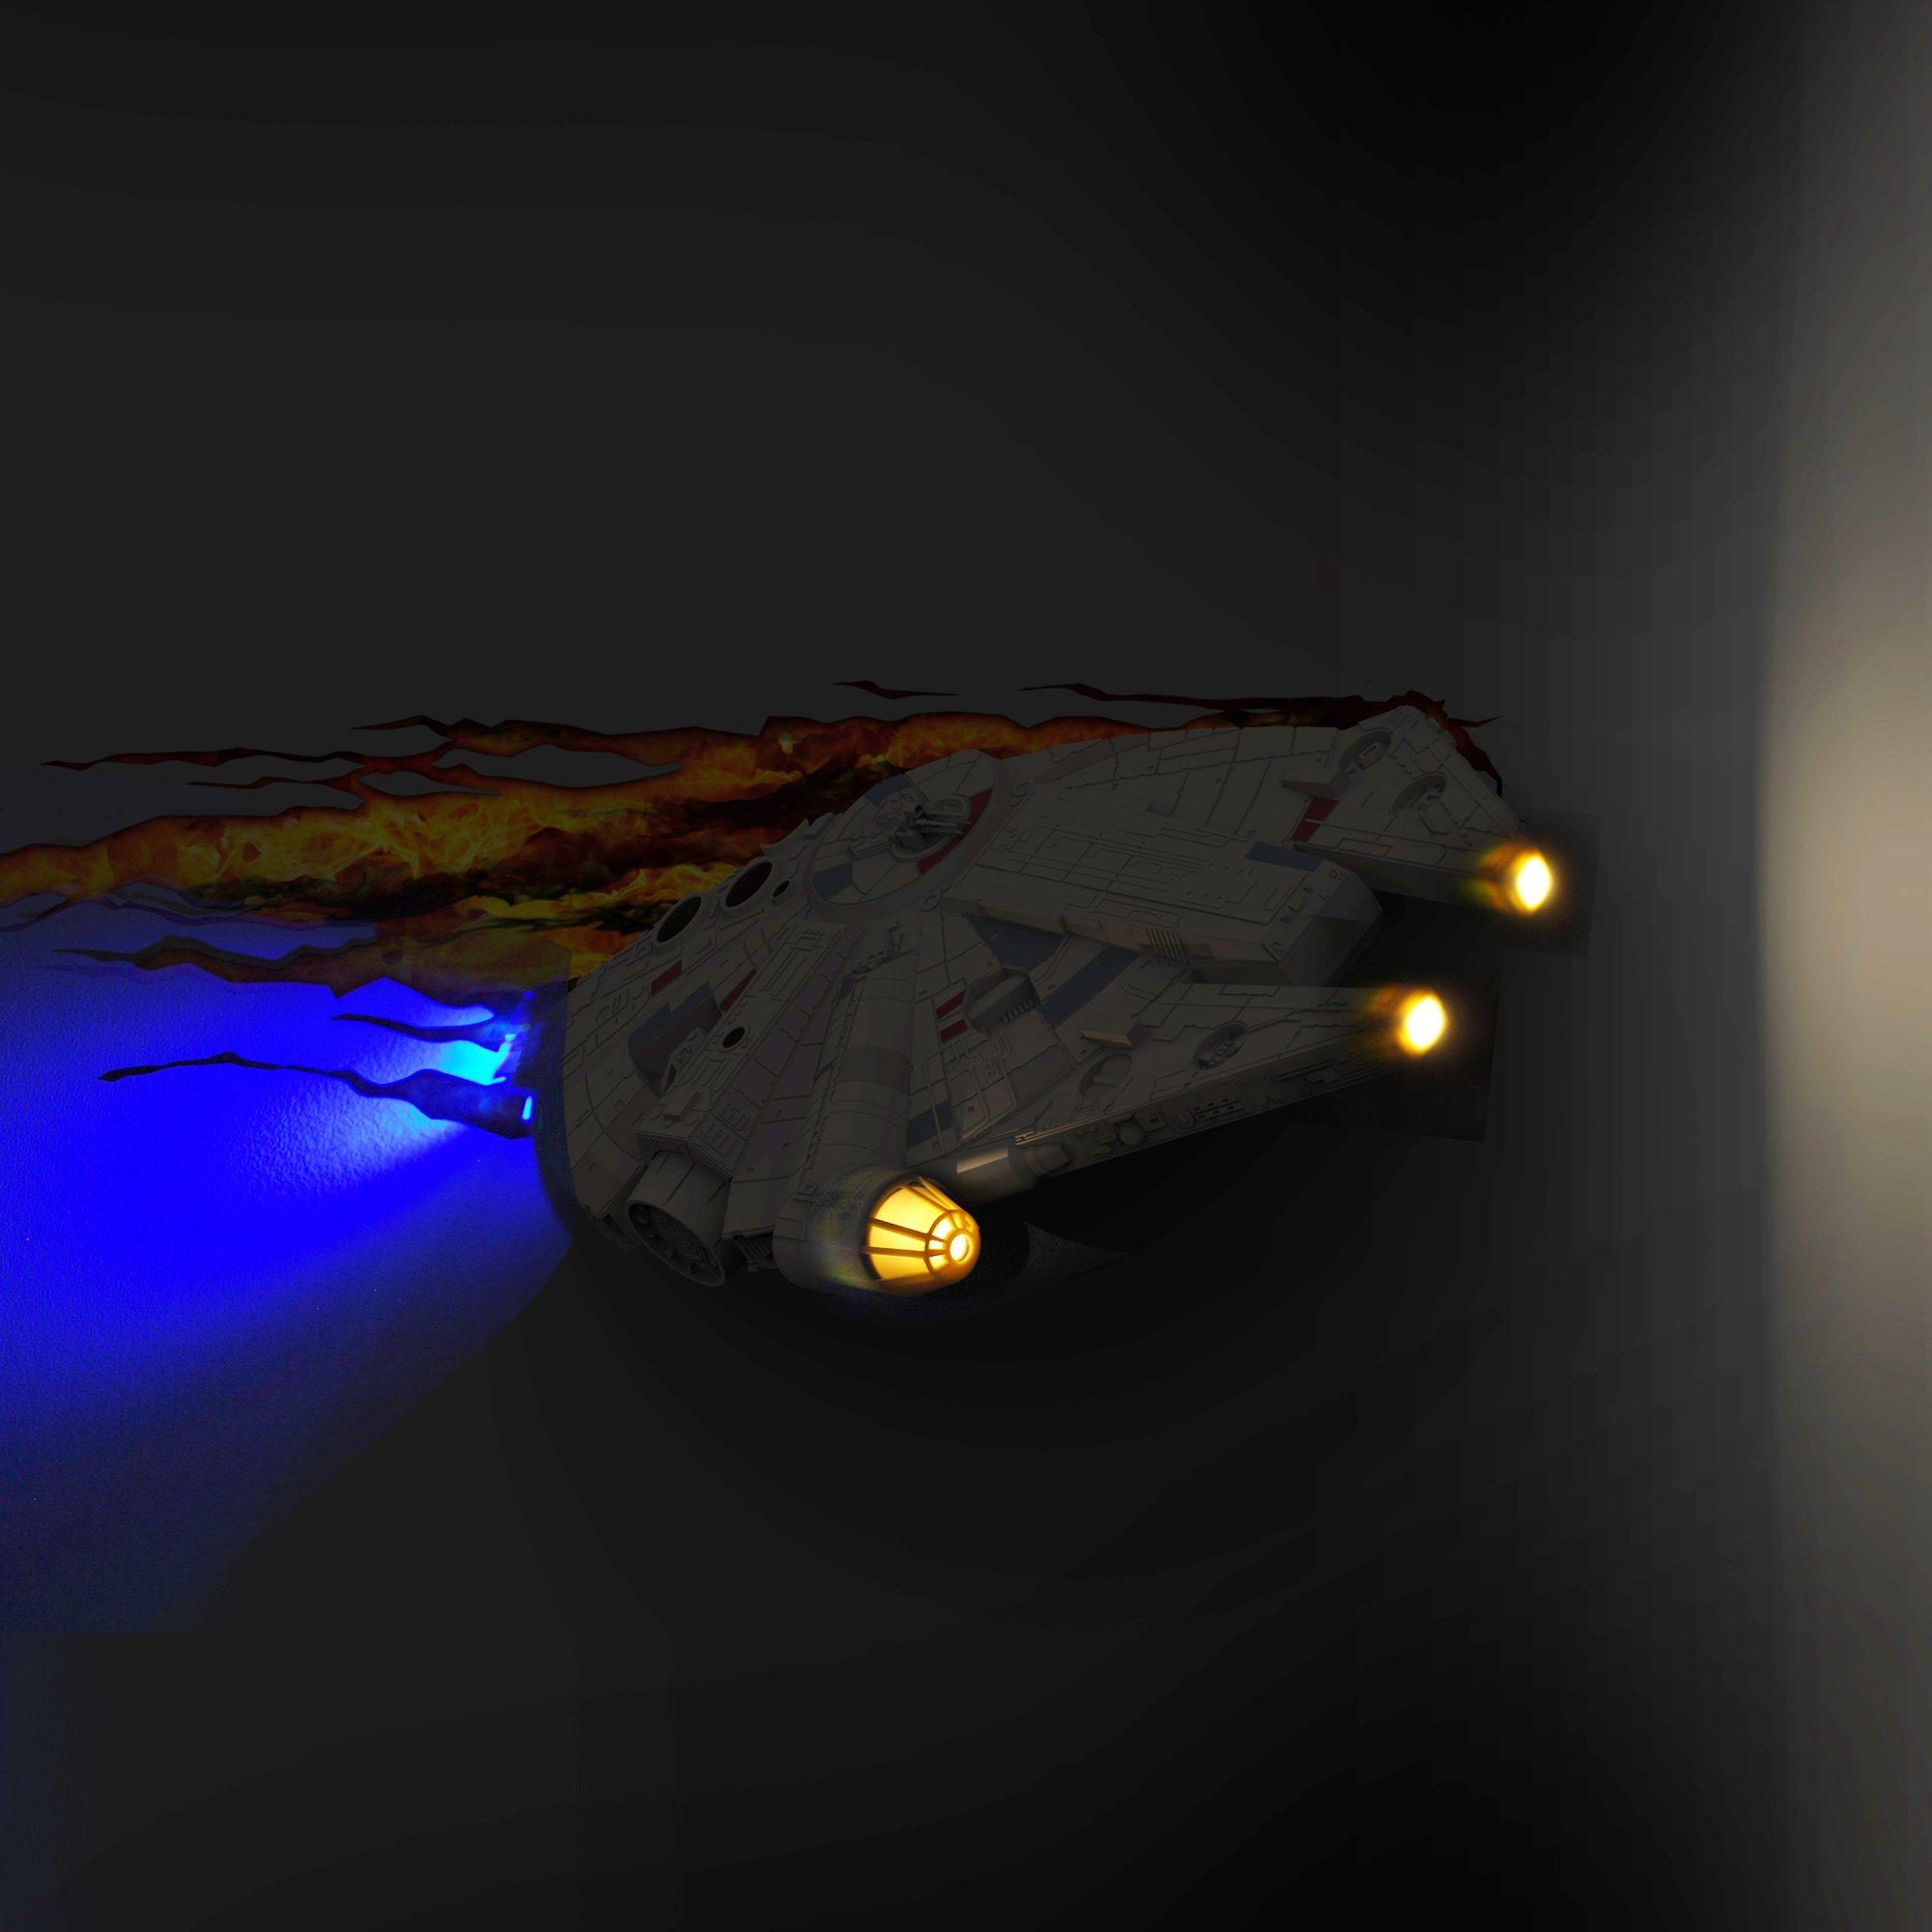 3DLightFX Star Wars Millennium Falcon 3D Deco Light by 3D light FX (Image #3)